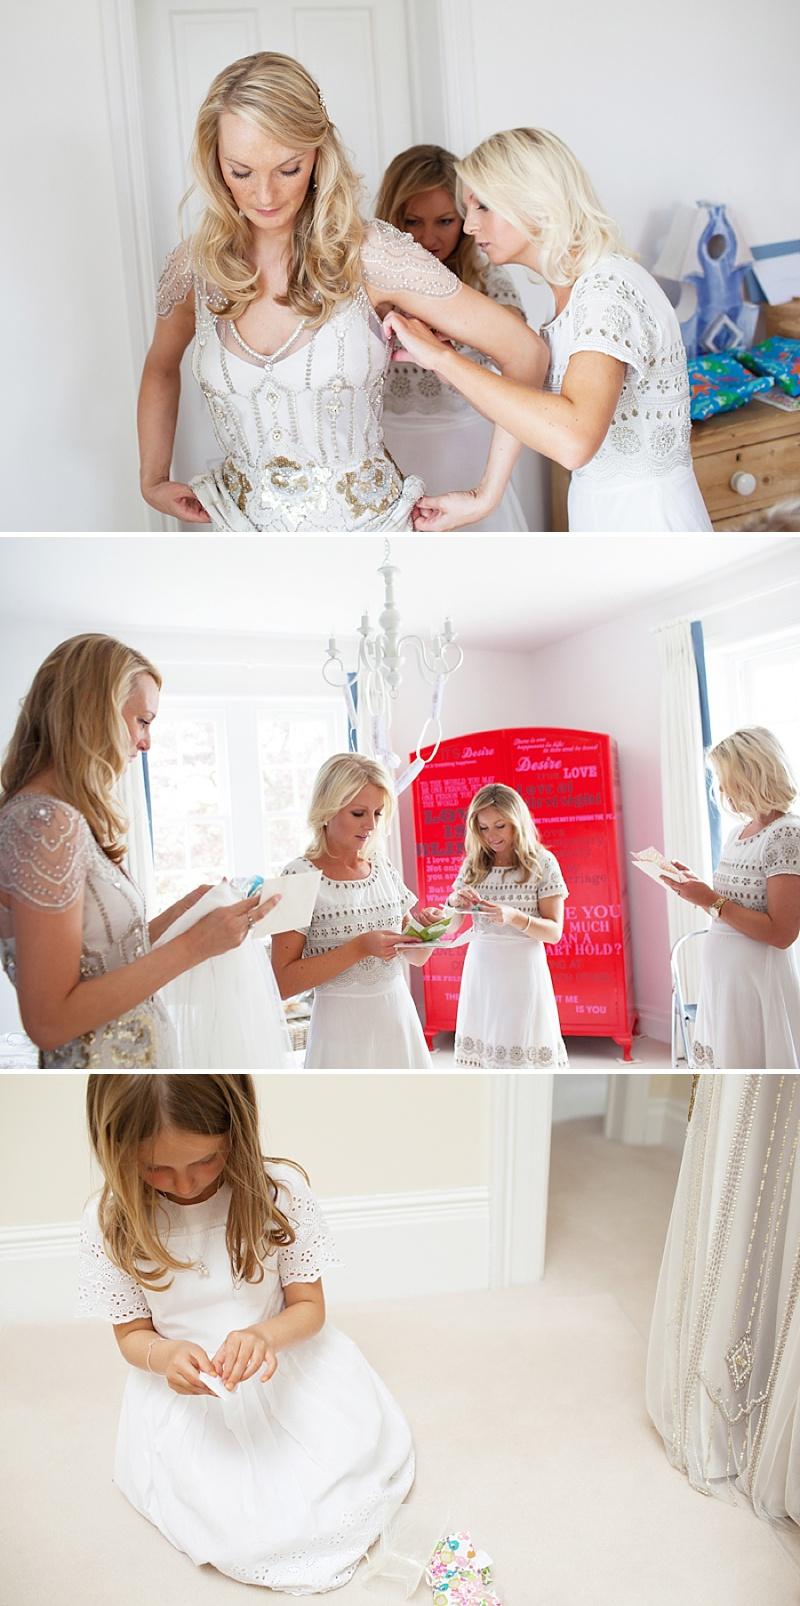 Summer Garden Party Wedding In Hertfordshire, Bride In Jenny Packham Eden Gown, Images by Annamarie Stepney_0003